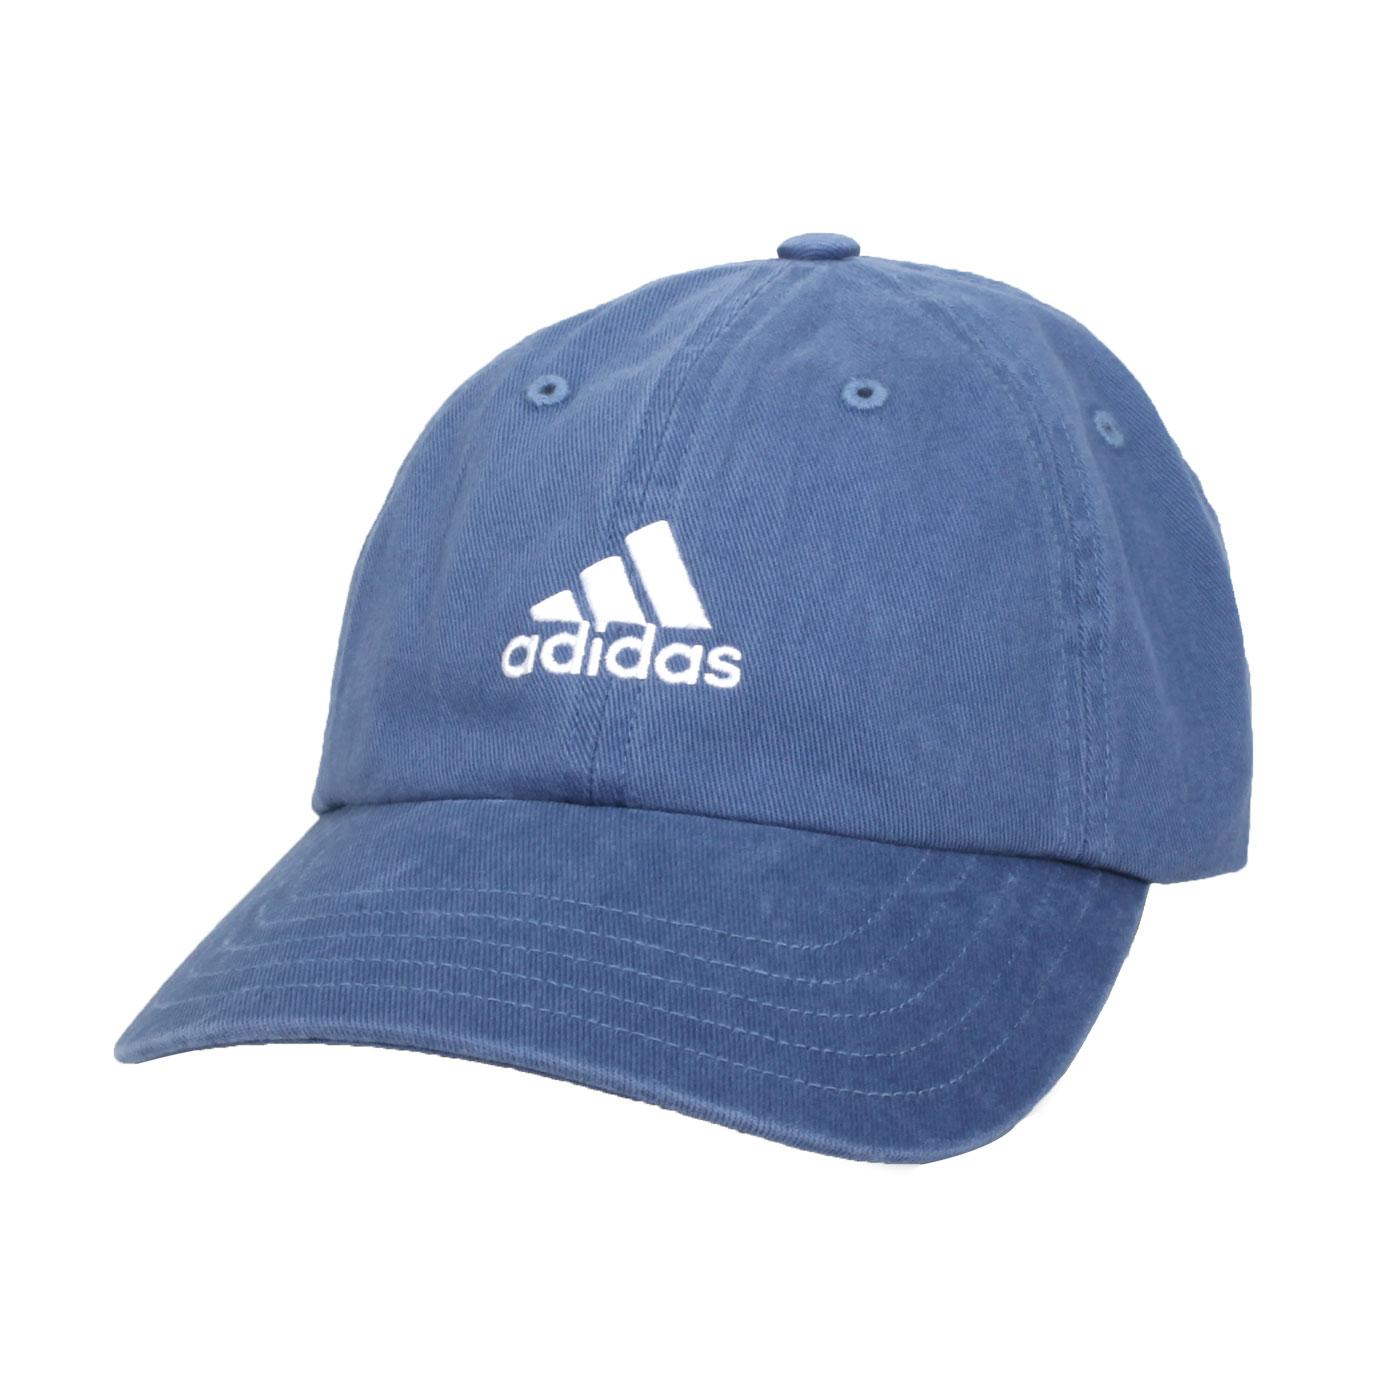 ADIDAS 帽子 GM6281